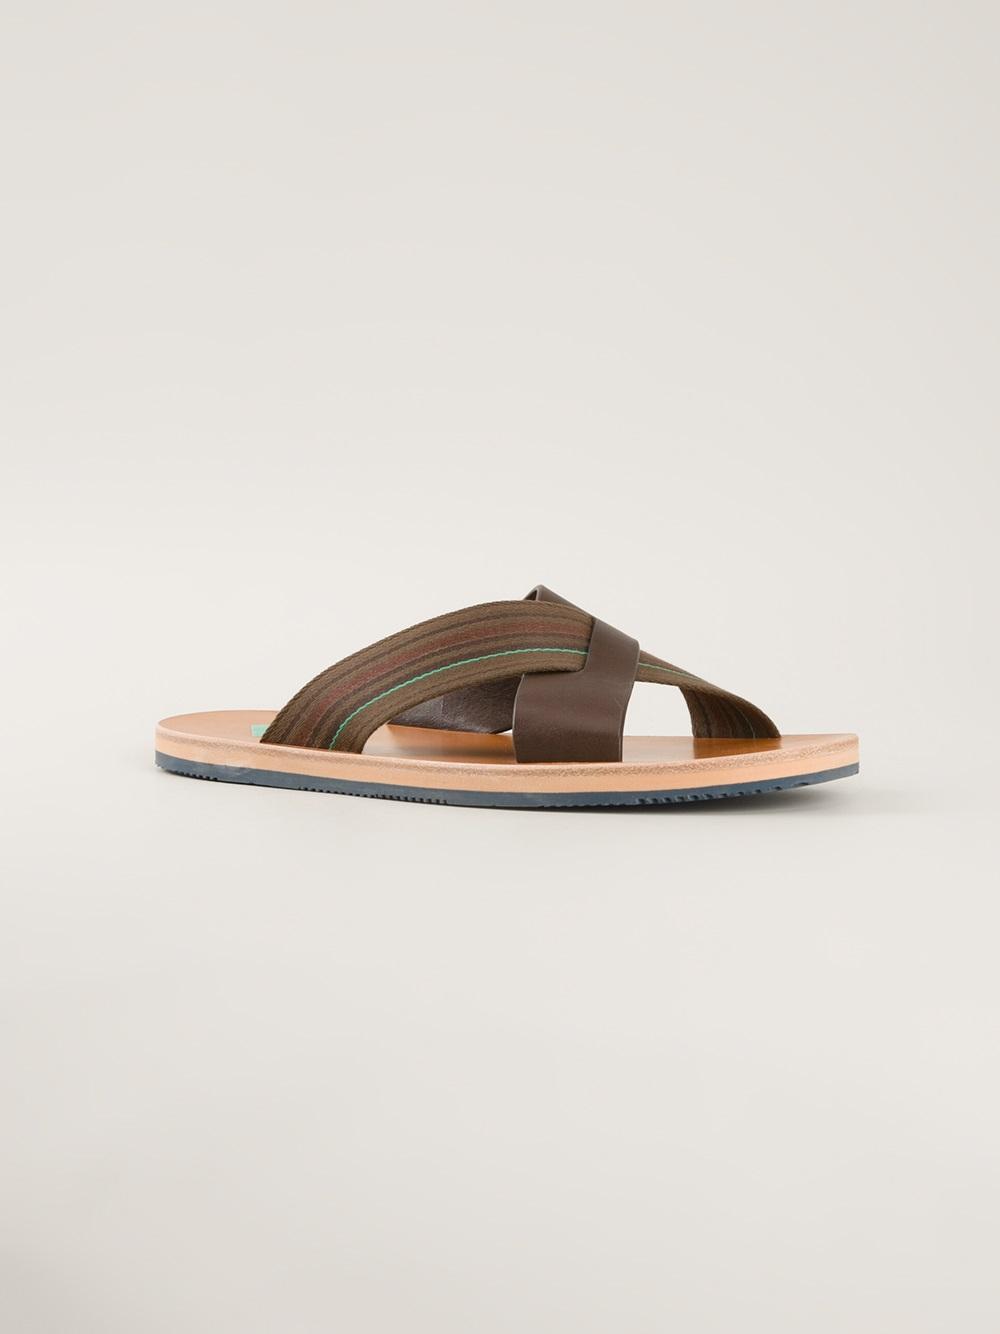 2a666c2b9578 Paul Smith Kohoutek Sandal in Brown for Men - Lyst